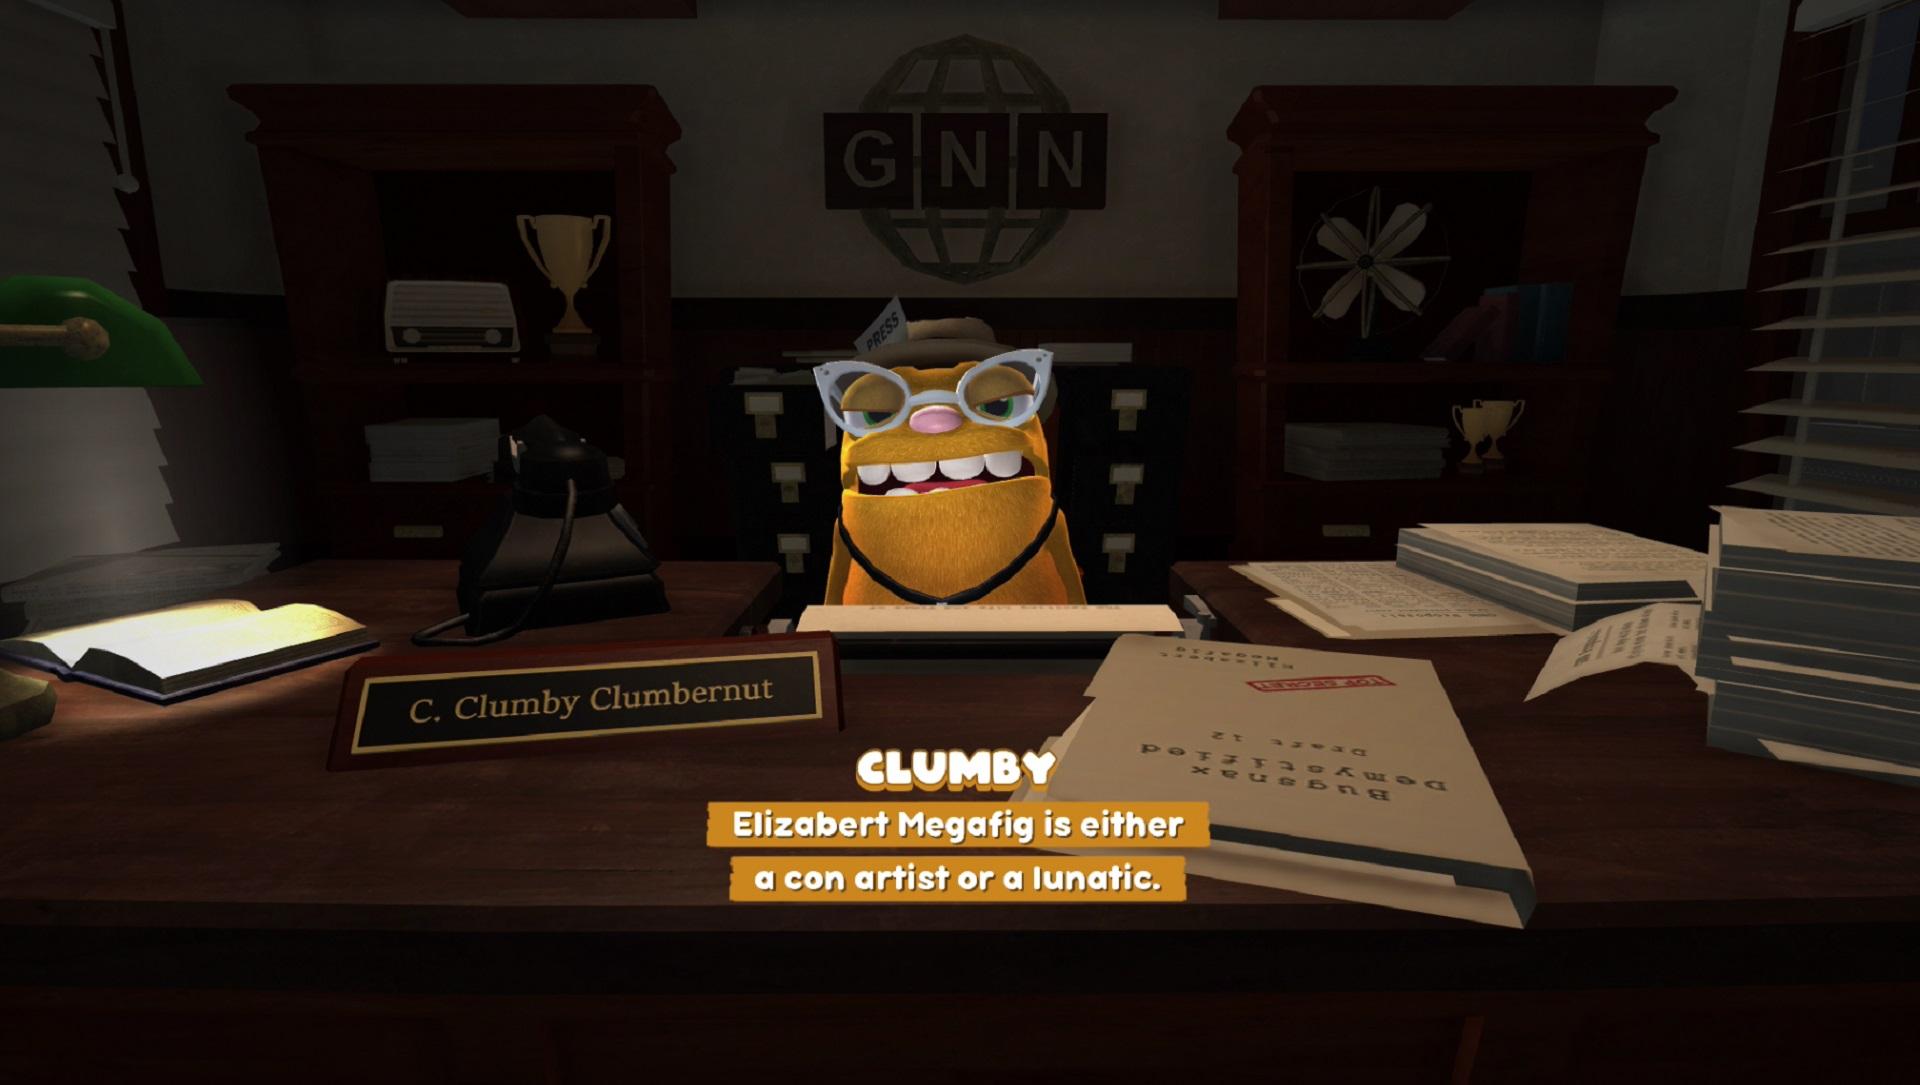 Your boss C. Clumby Clumbernut.